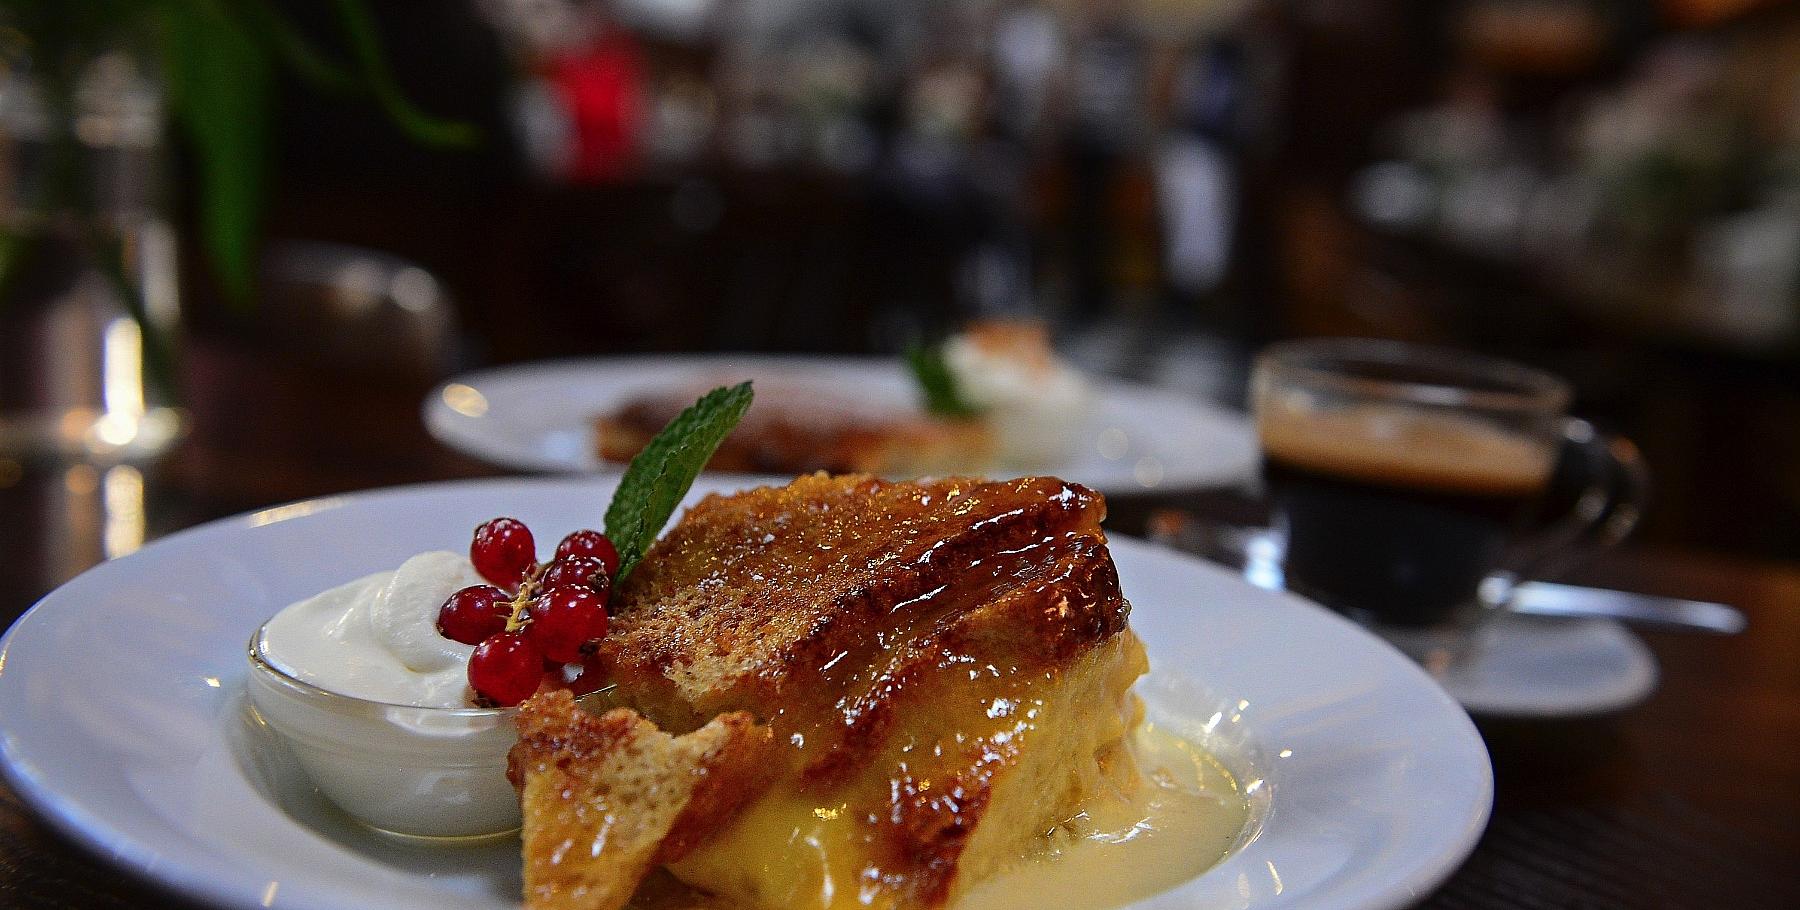 Pudding at The Farmgate Cafe Cork. Photo Clare O'Rourke